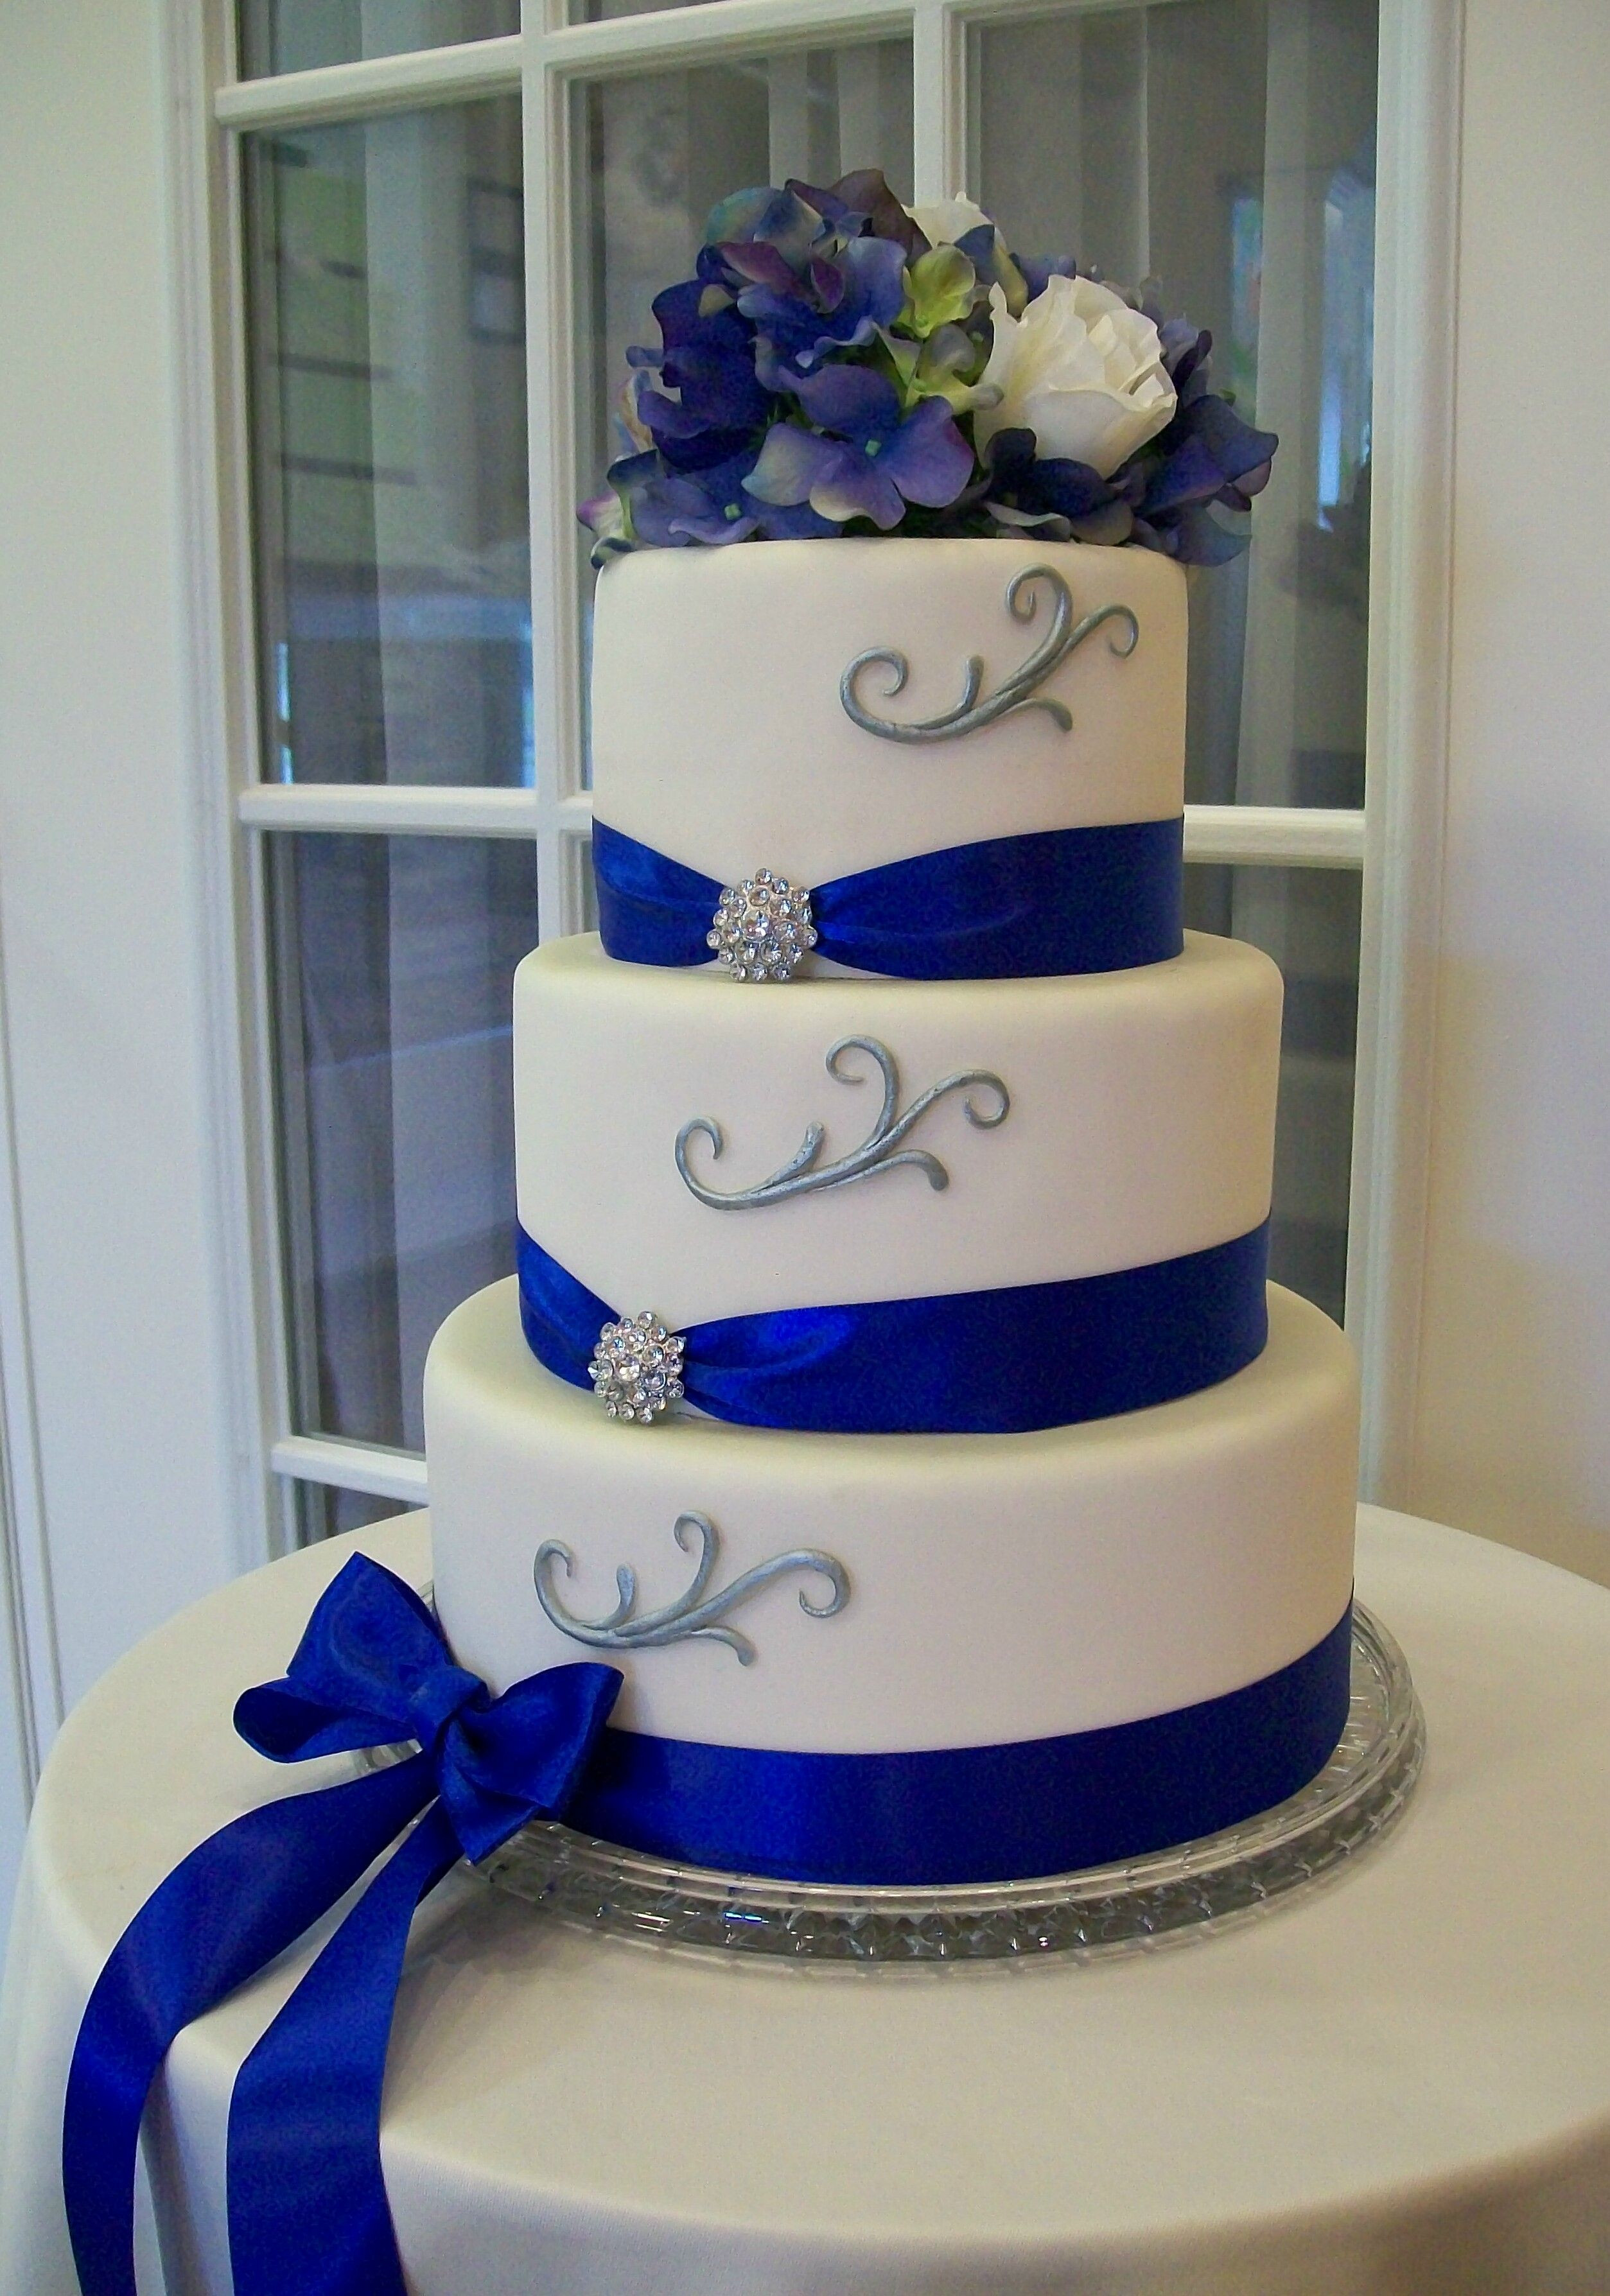 Wedding Cakes Royal Blue  Royal blue wedding cakes idea in 2017